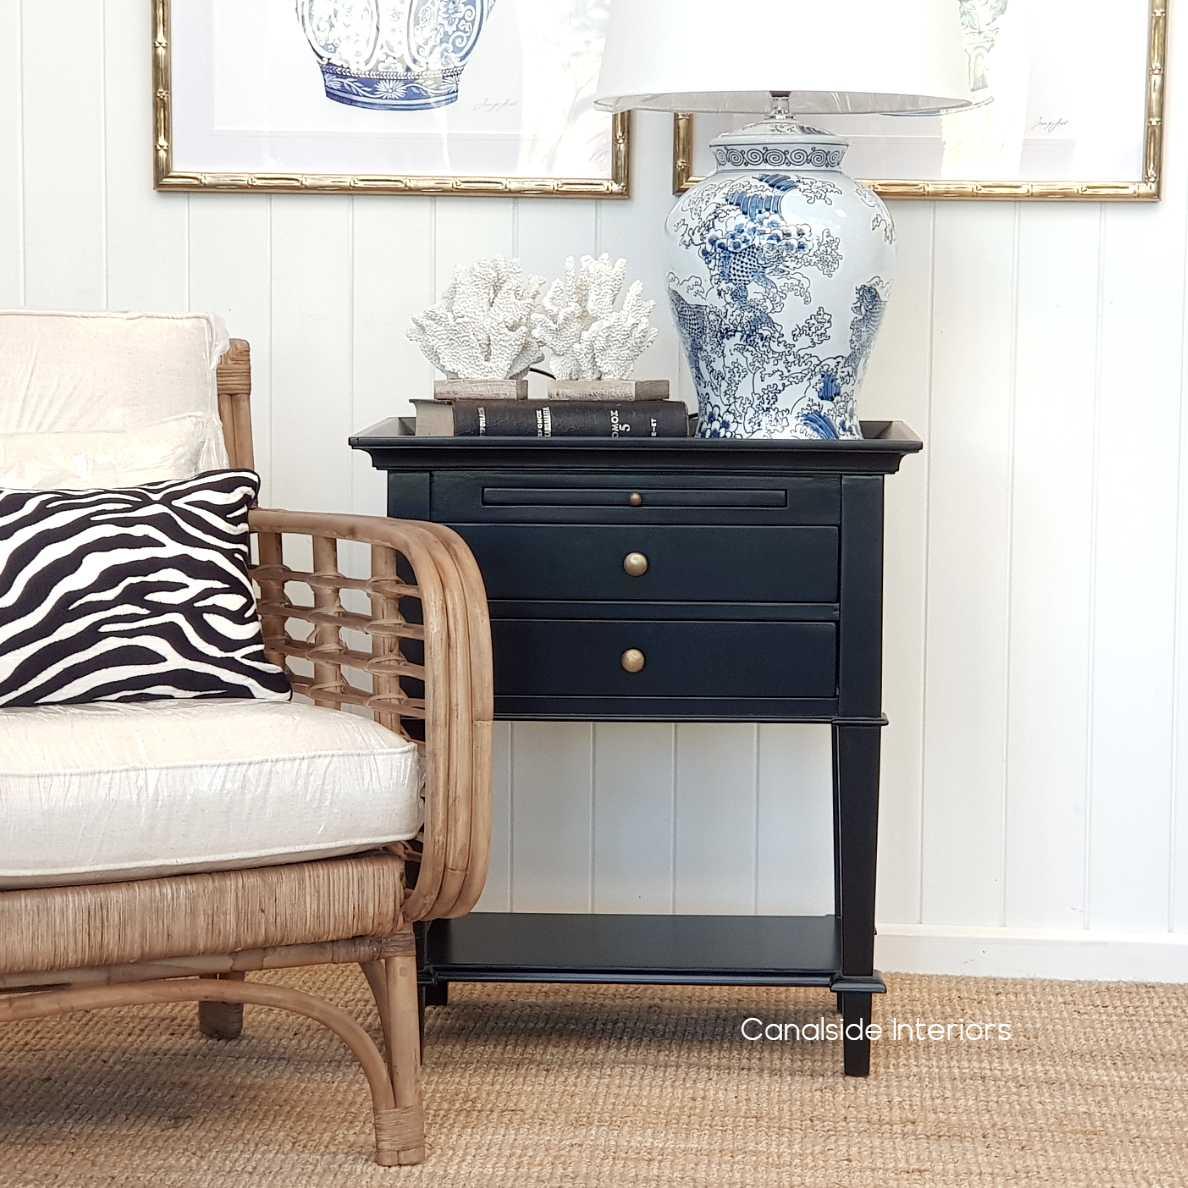 Butler Side Table Bedside Black TABLES, TABLES Side Tables, LIVING Coffee & Side Tables, BEDROOM Bedsides nightstand hamptons